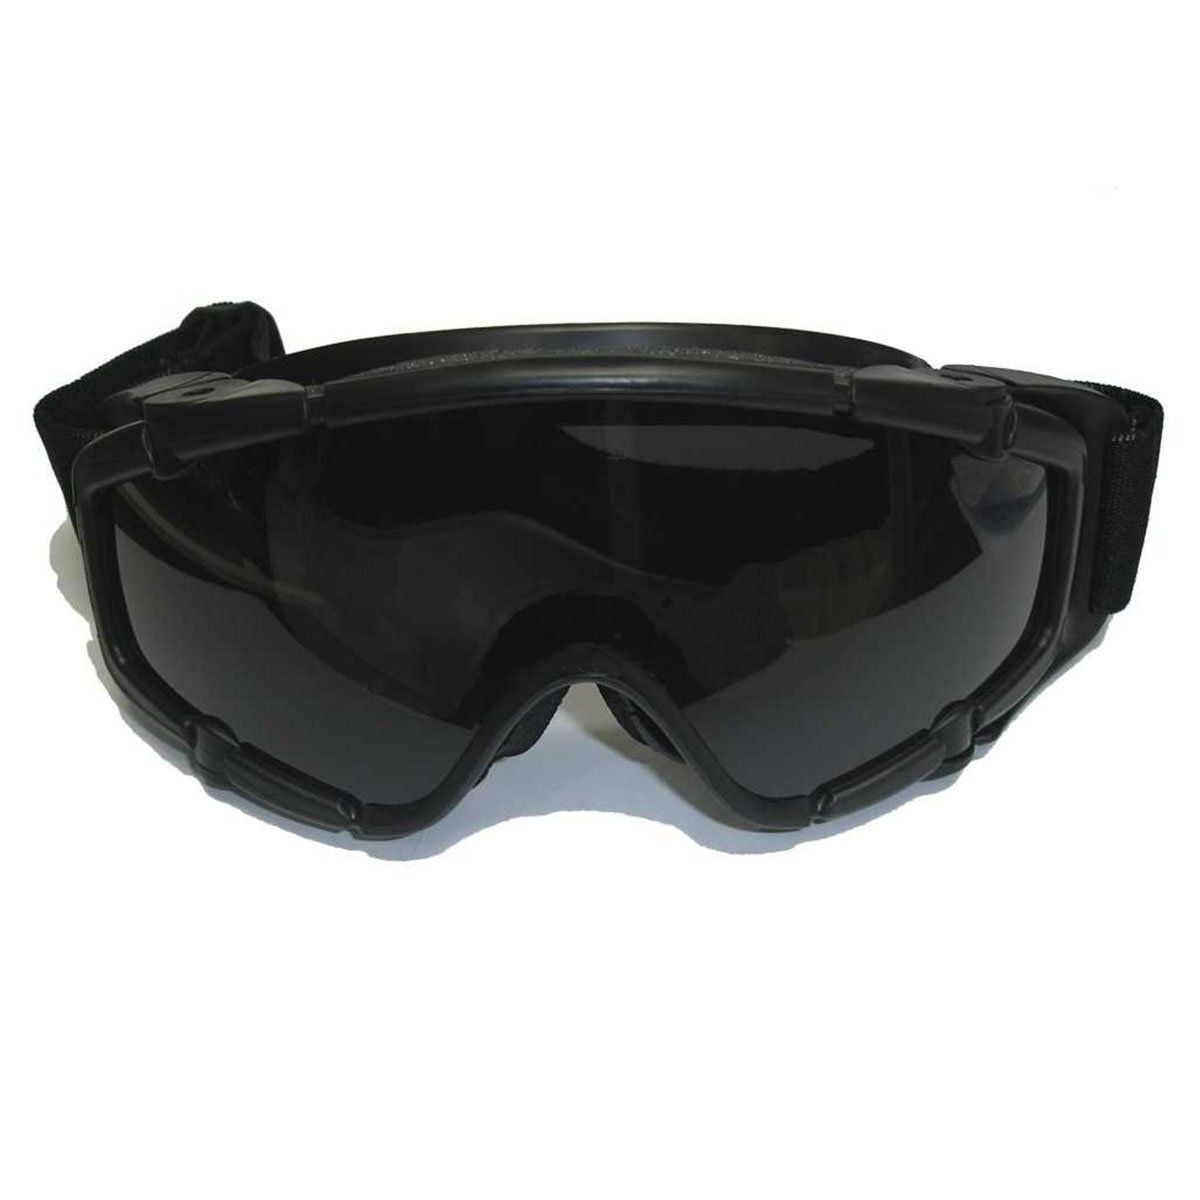 Oculos de Protecao FMA SI-Ballisic Preto com 2 Lentes